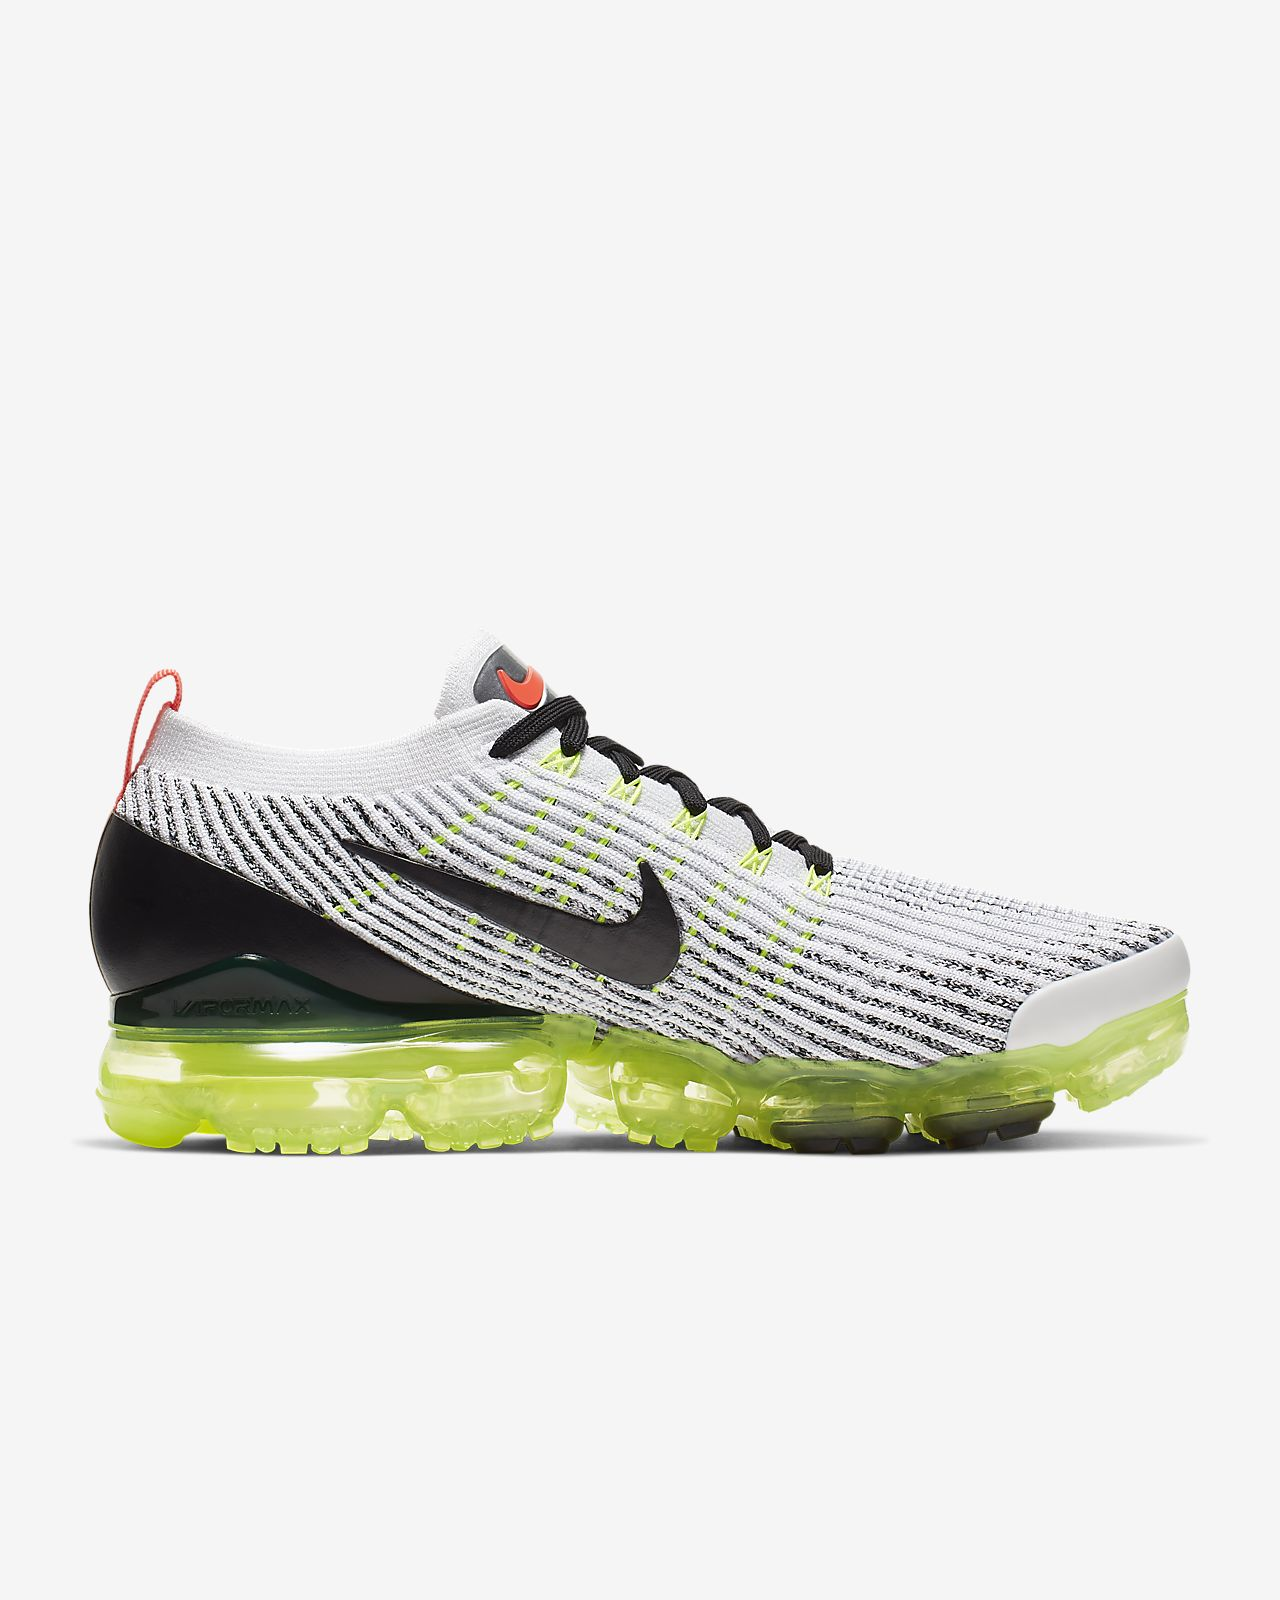 6663cbdd33 Nike Air VaporMax Flyknit 3 Men's Shoe. Nike.com PT